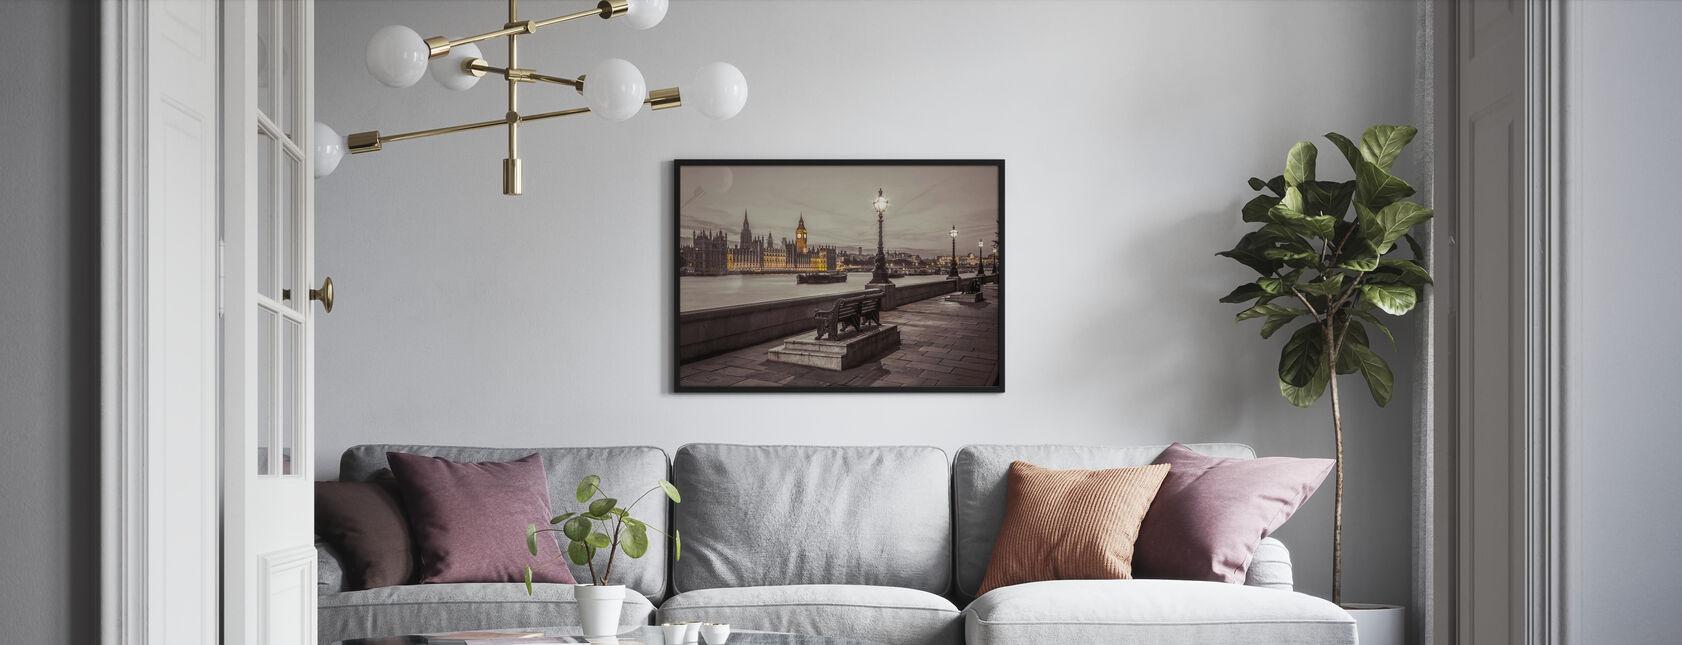 London by Night - Framed print - Living Room